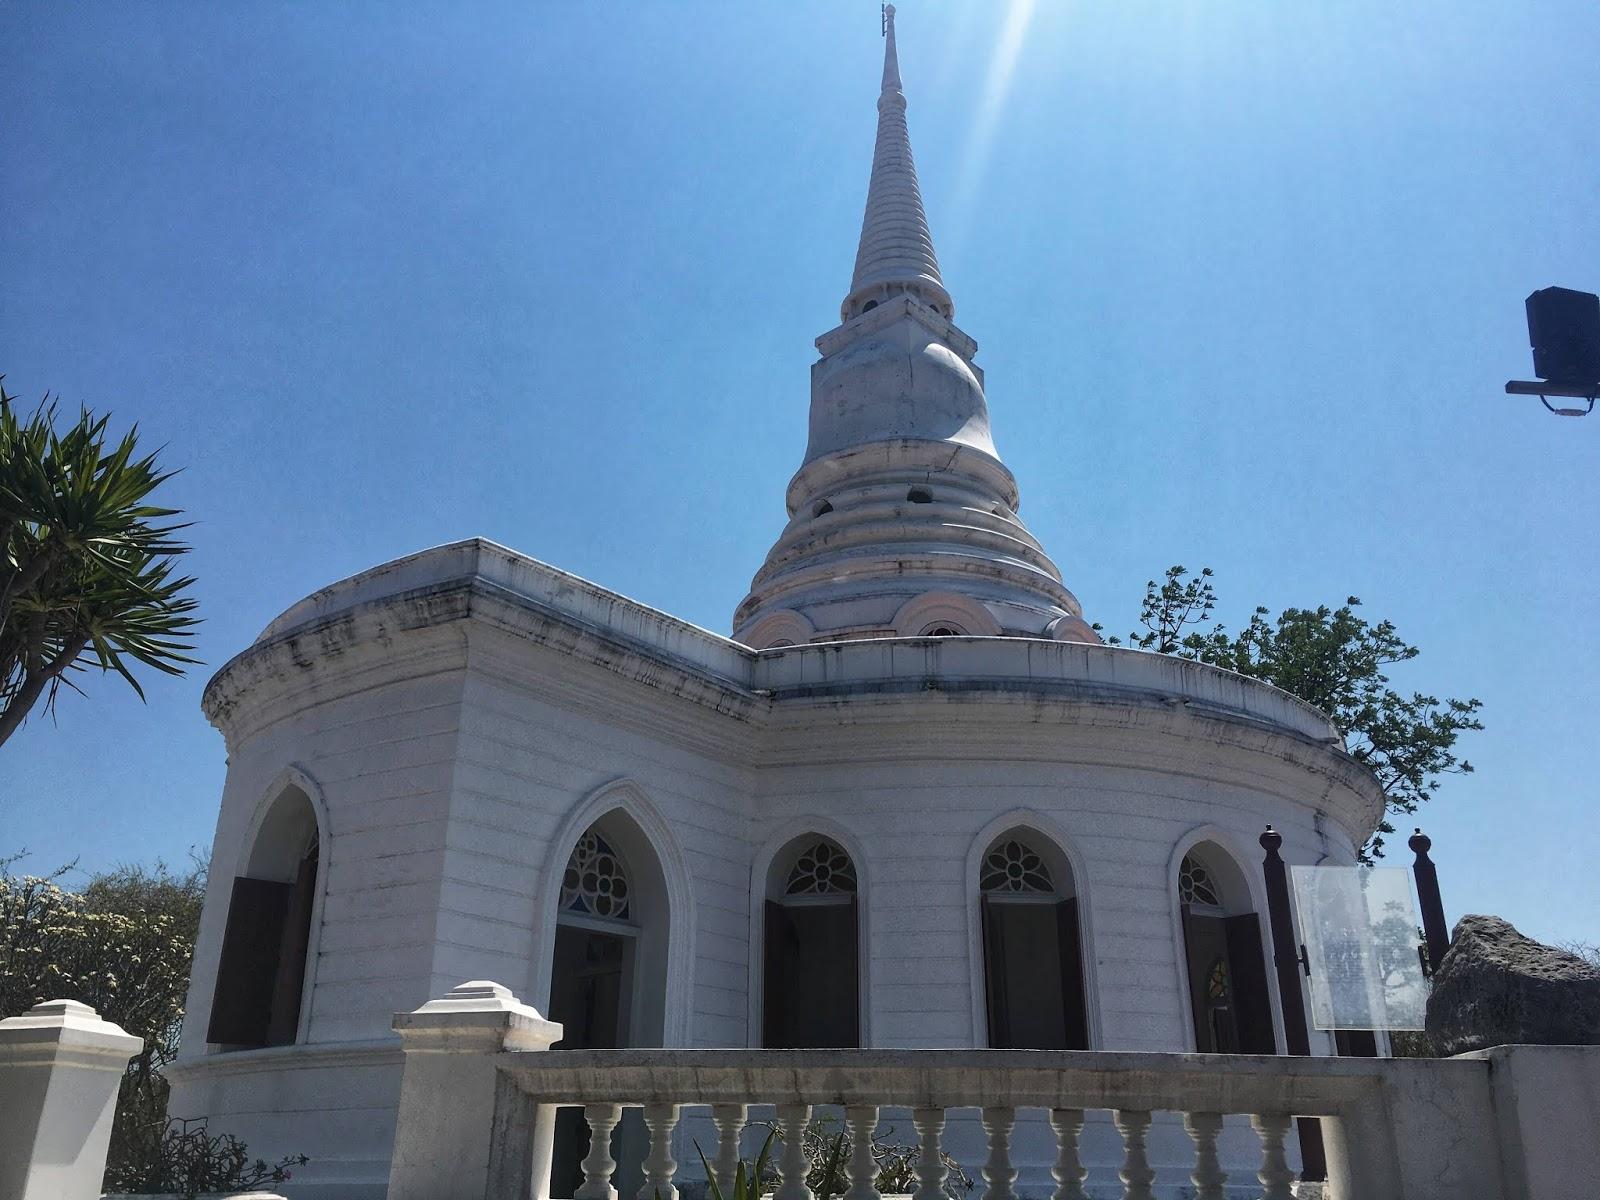 a Buddhist temple that looks like a Christian church, koh sichang, thailand